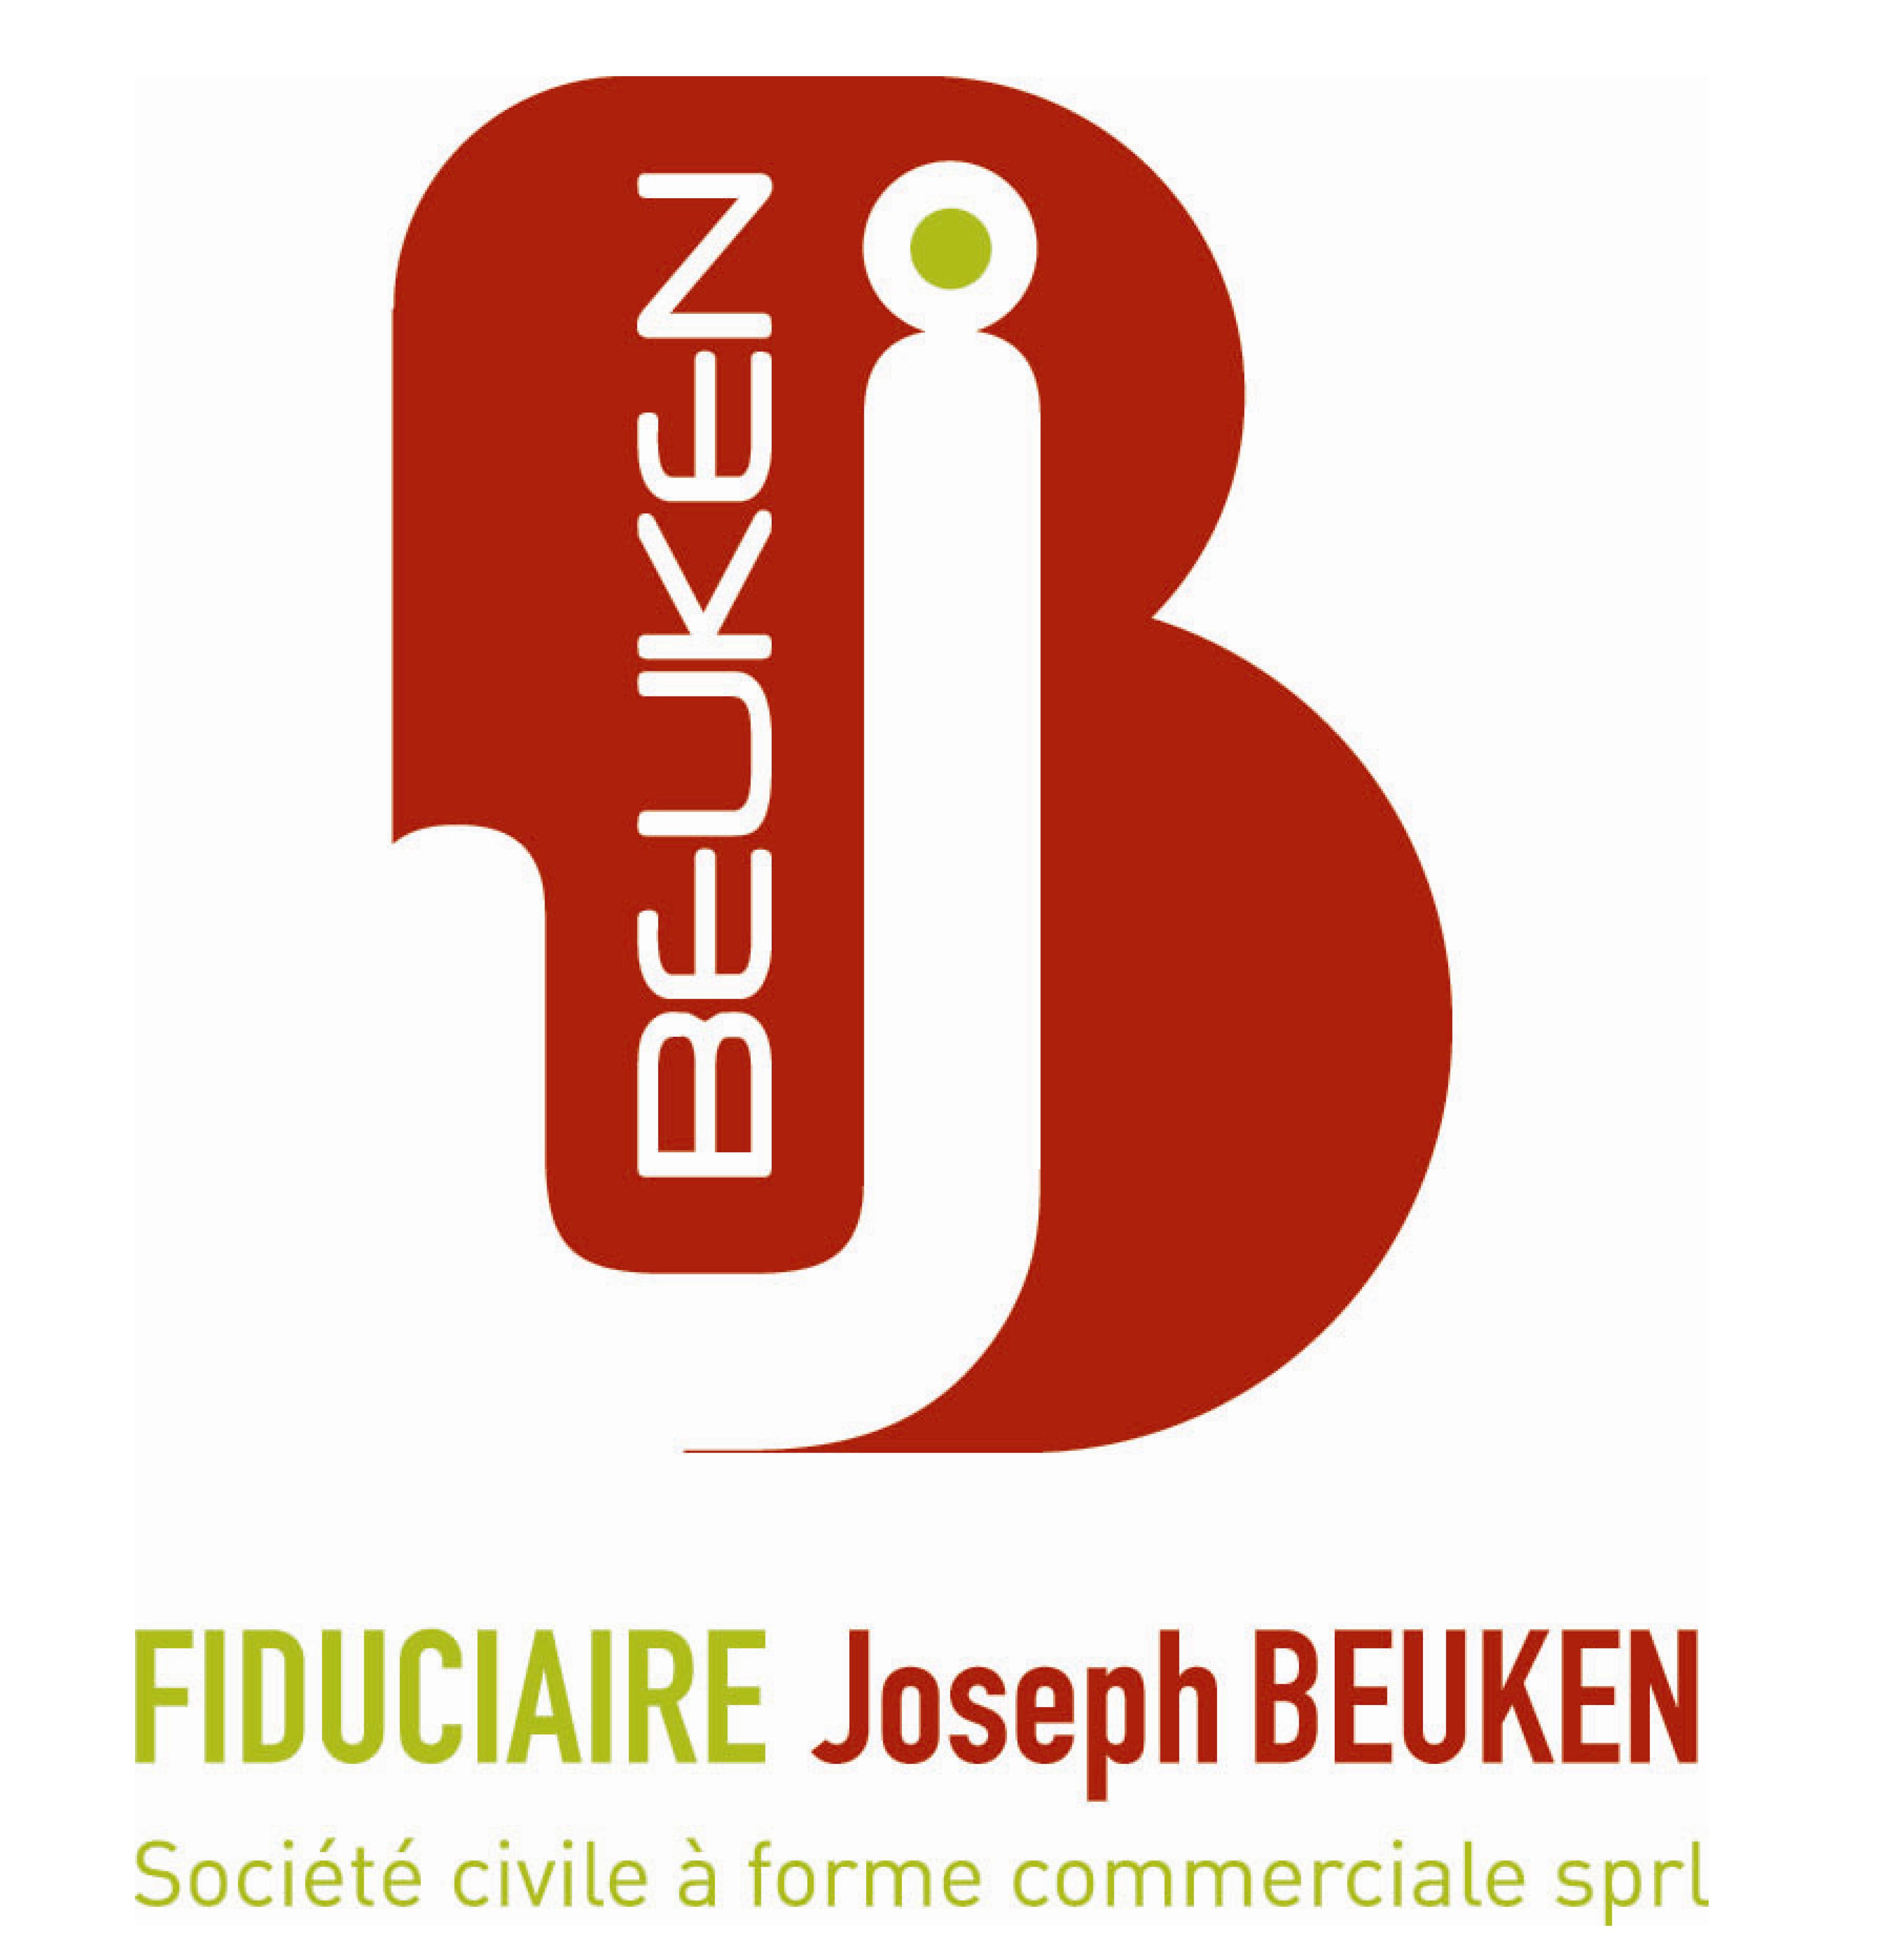 Joseph Beuken